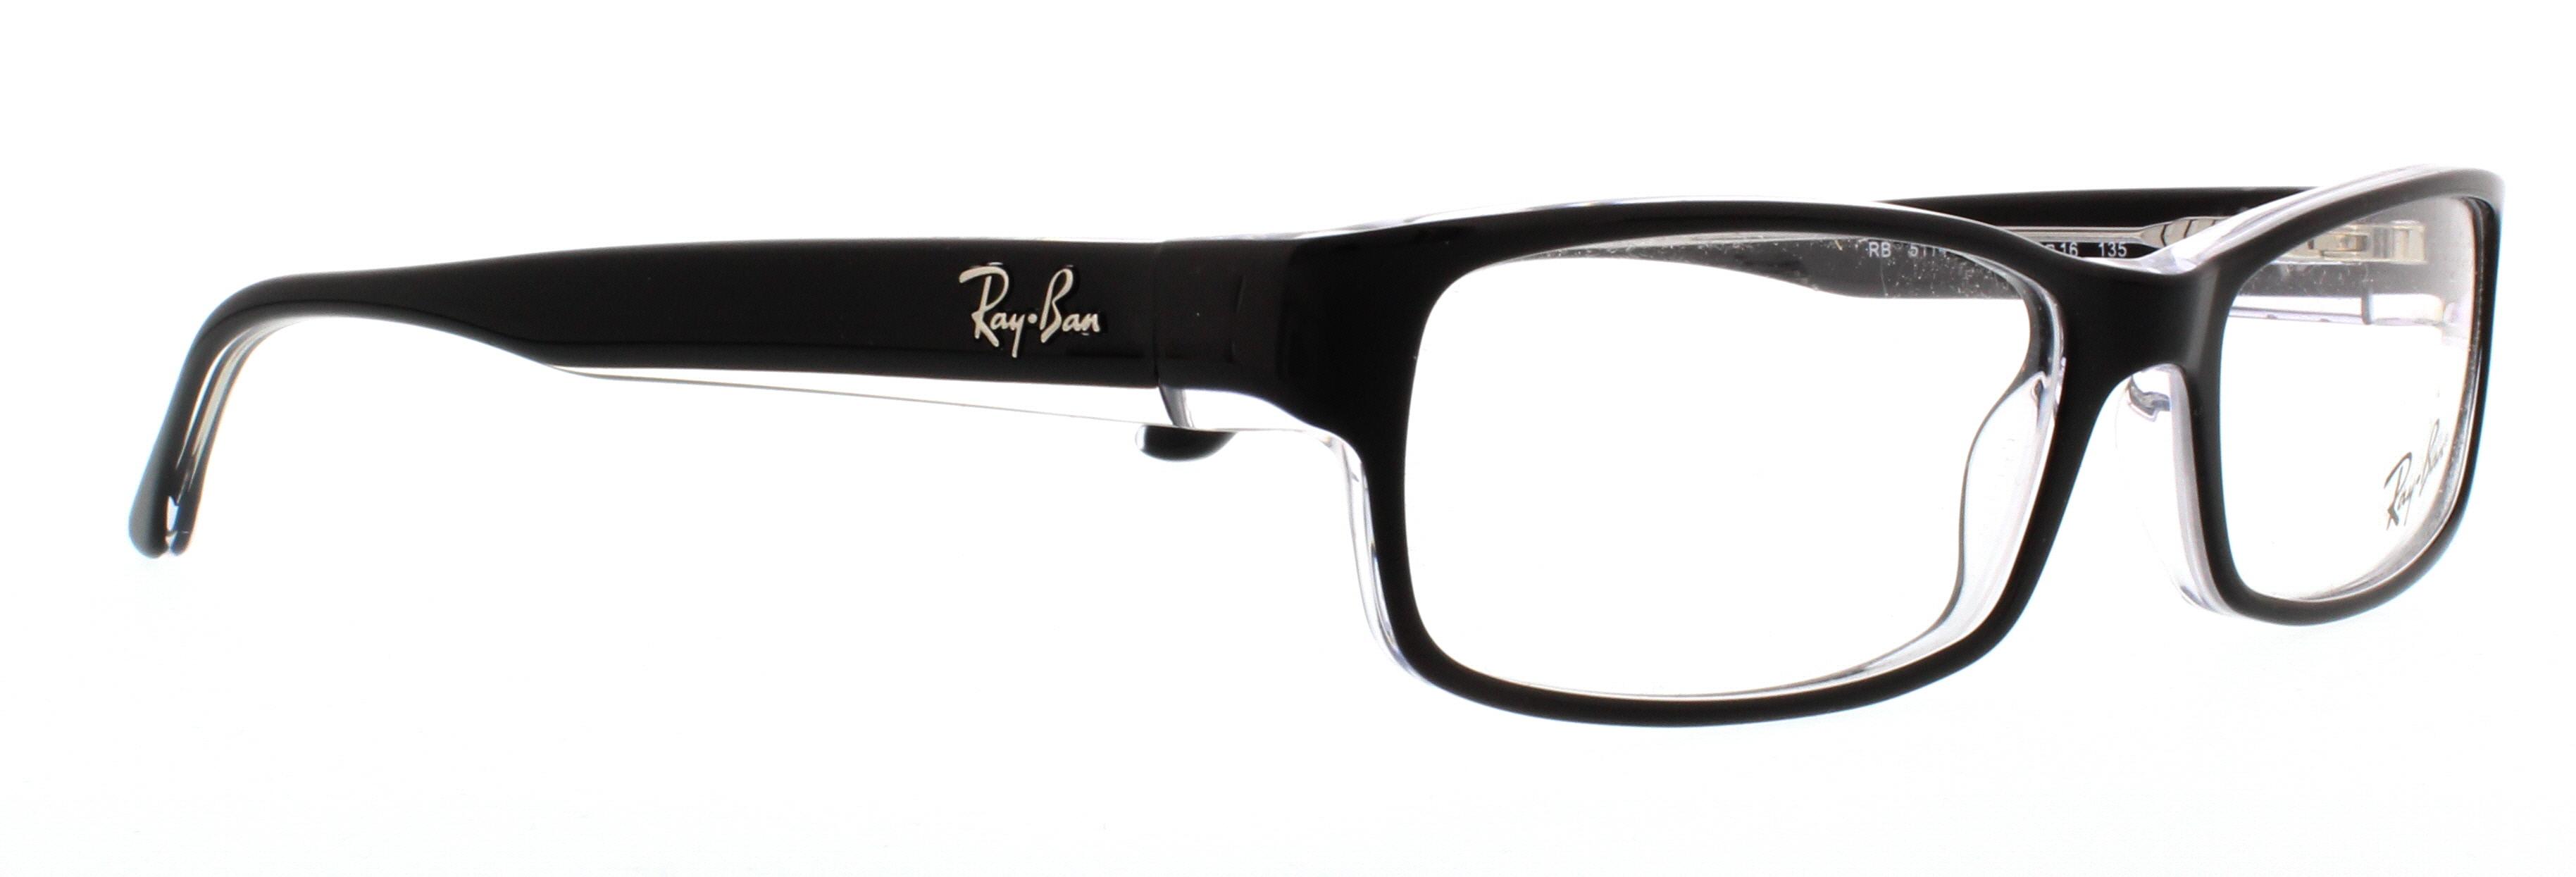 97179b7e222 Designer Frames Outlet. Ray Ban RX5114